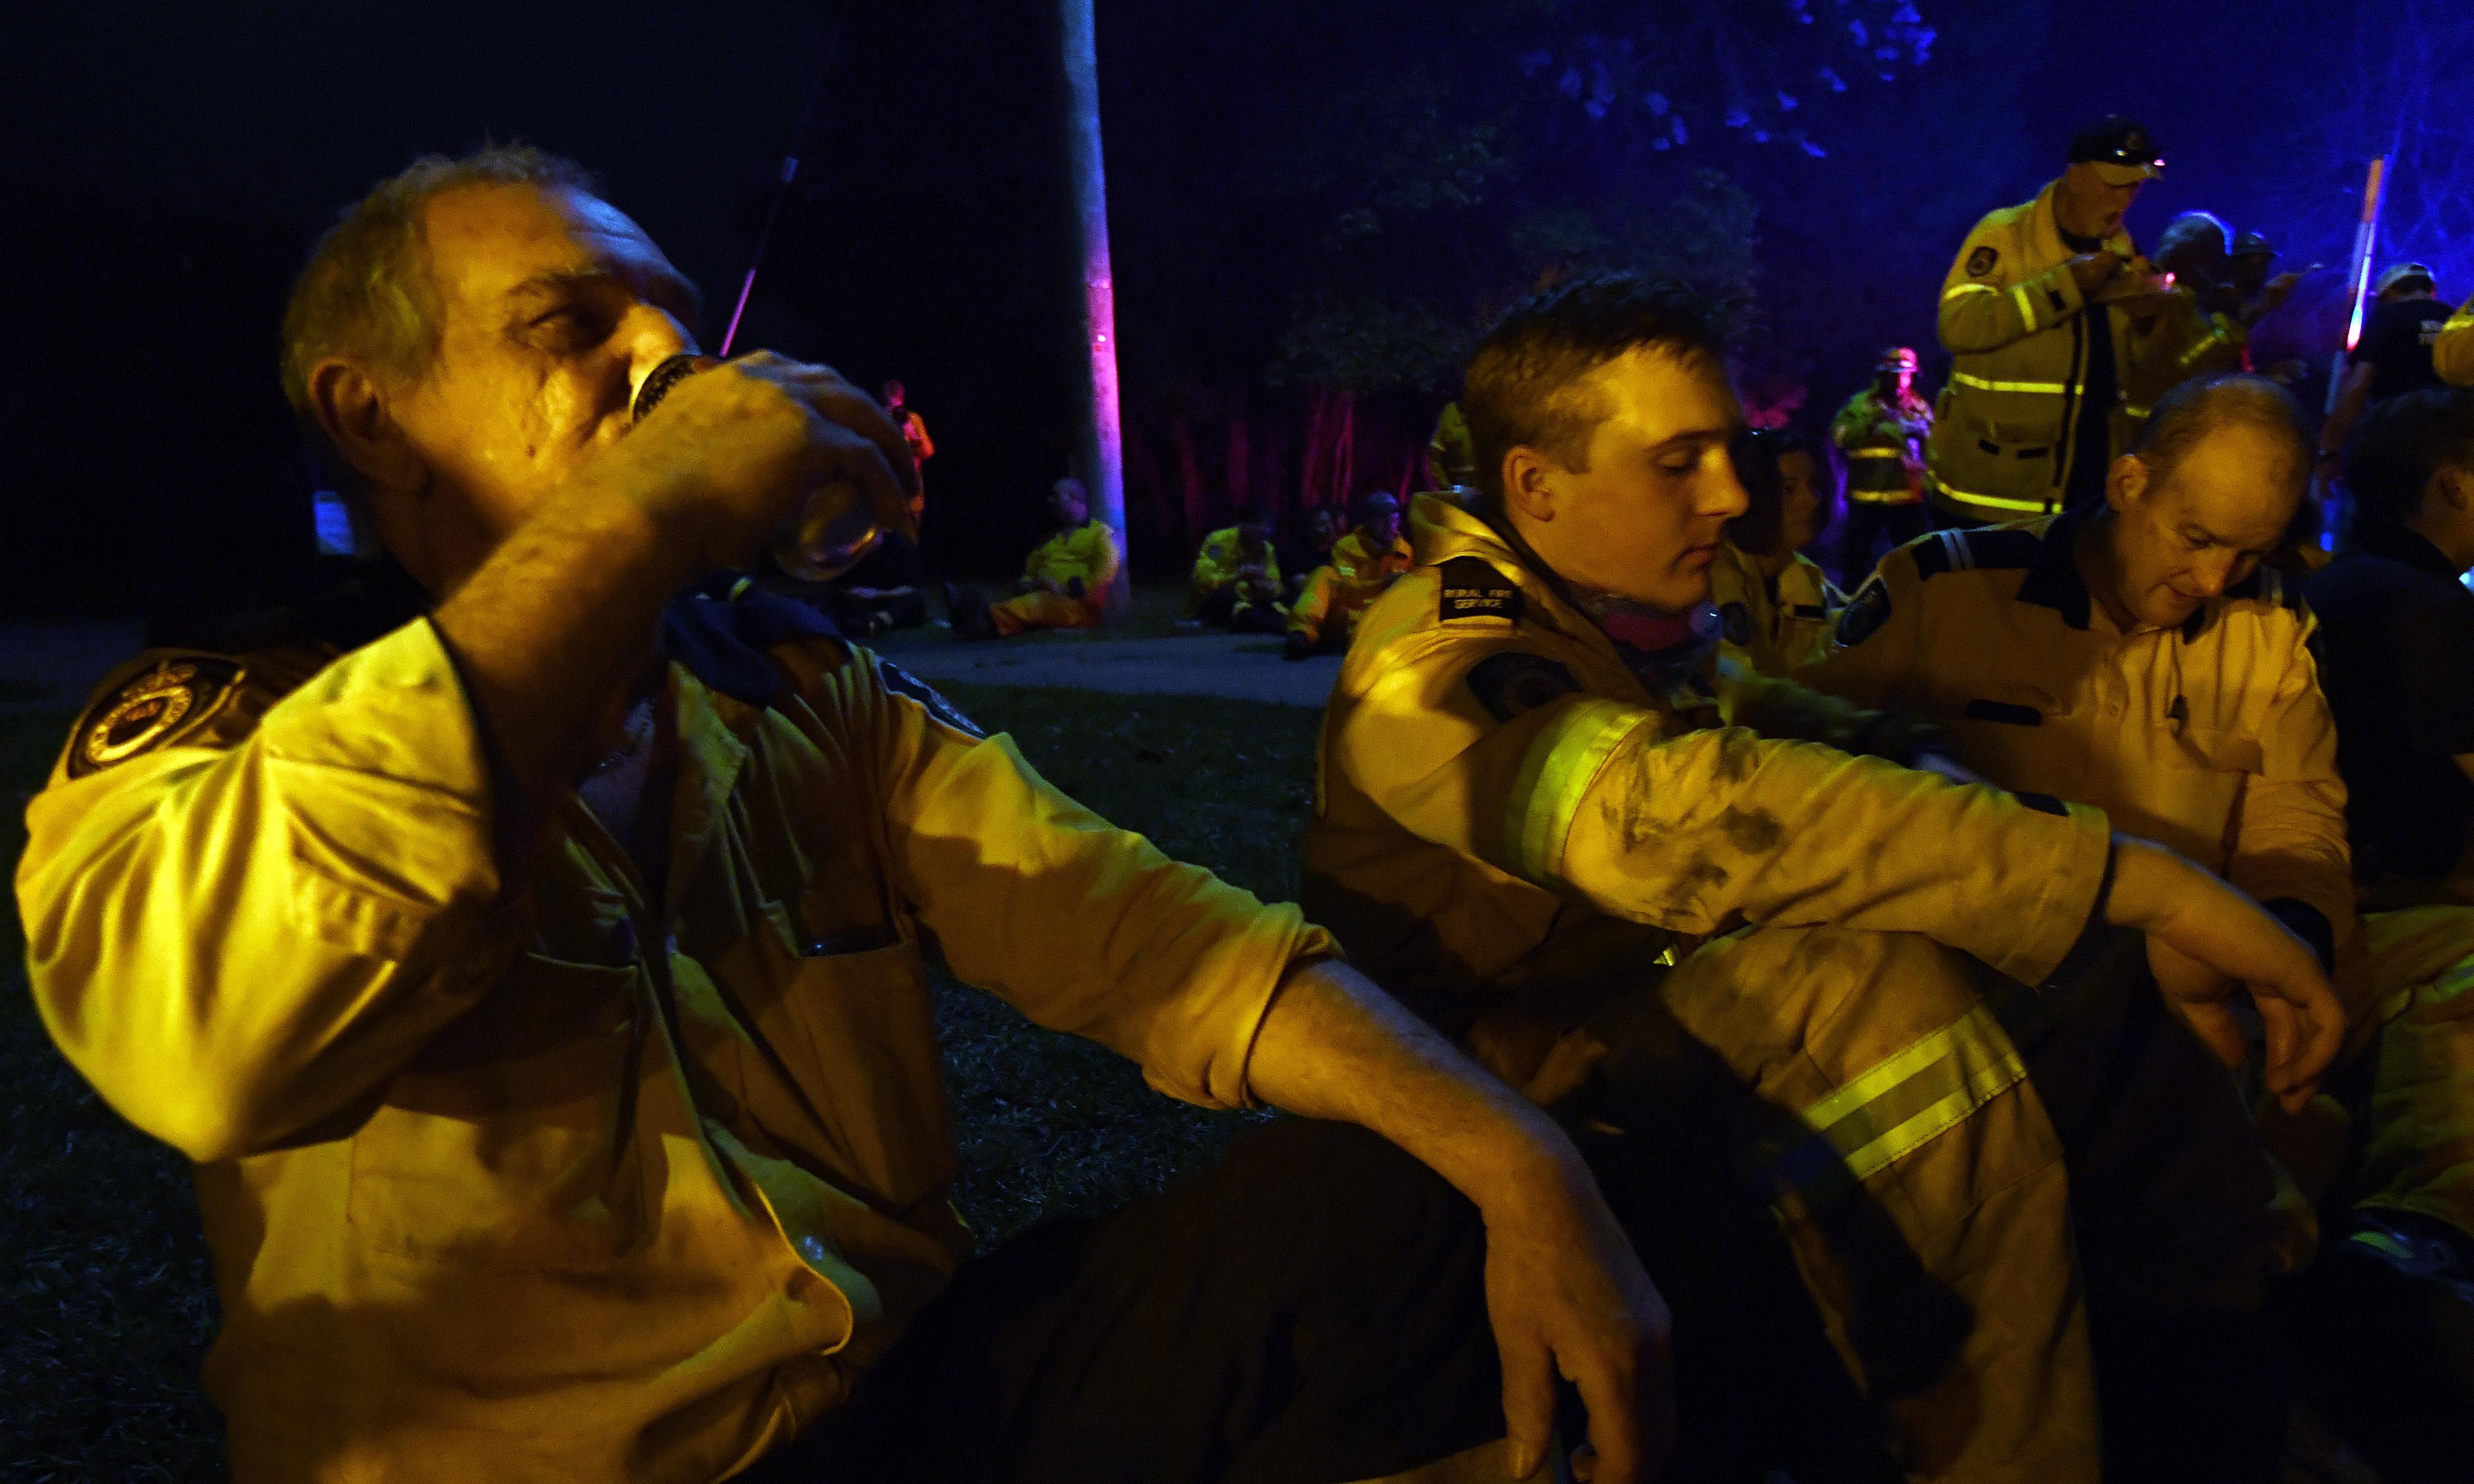 'Victoria isn't burning, but it will': Australia's fire chiefs fear fatigue will take terrible toll